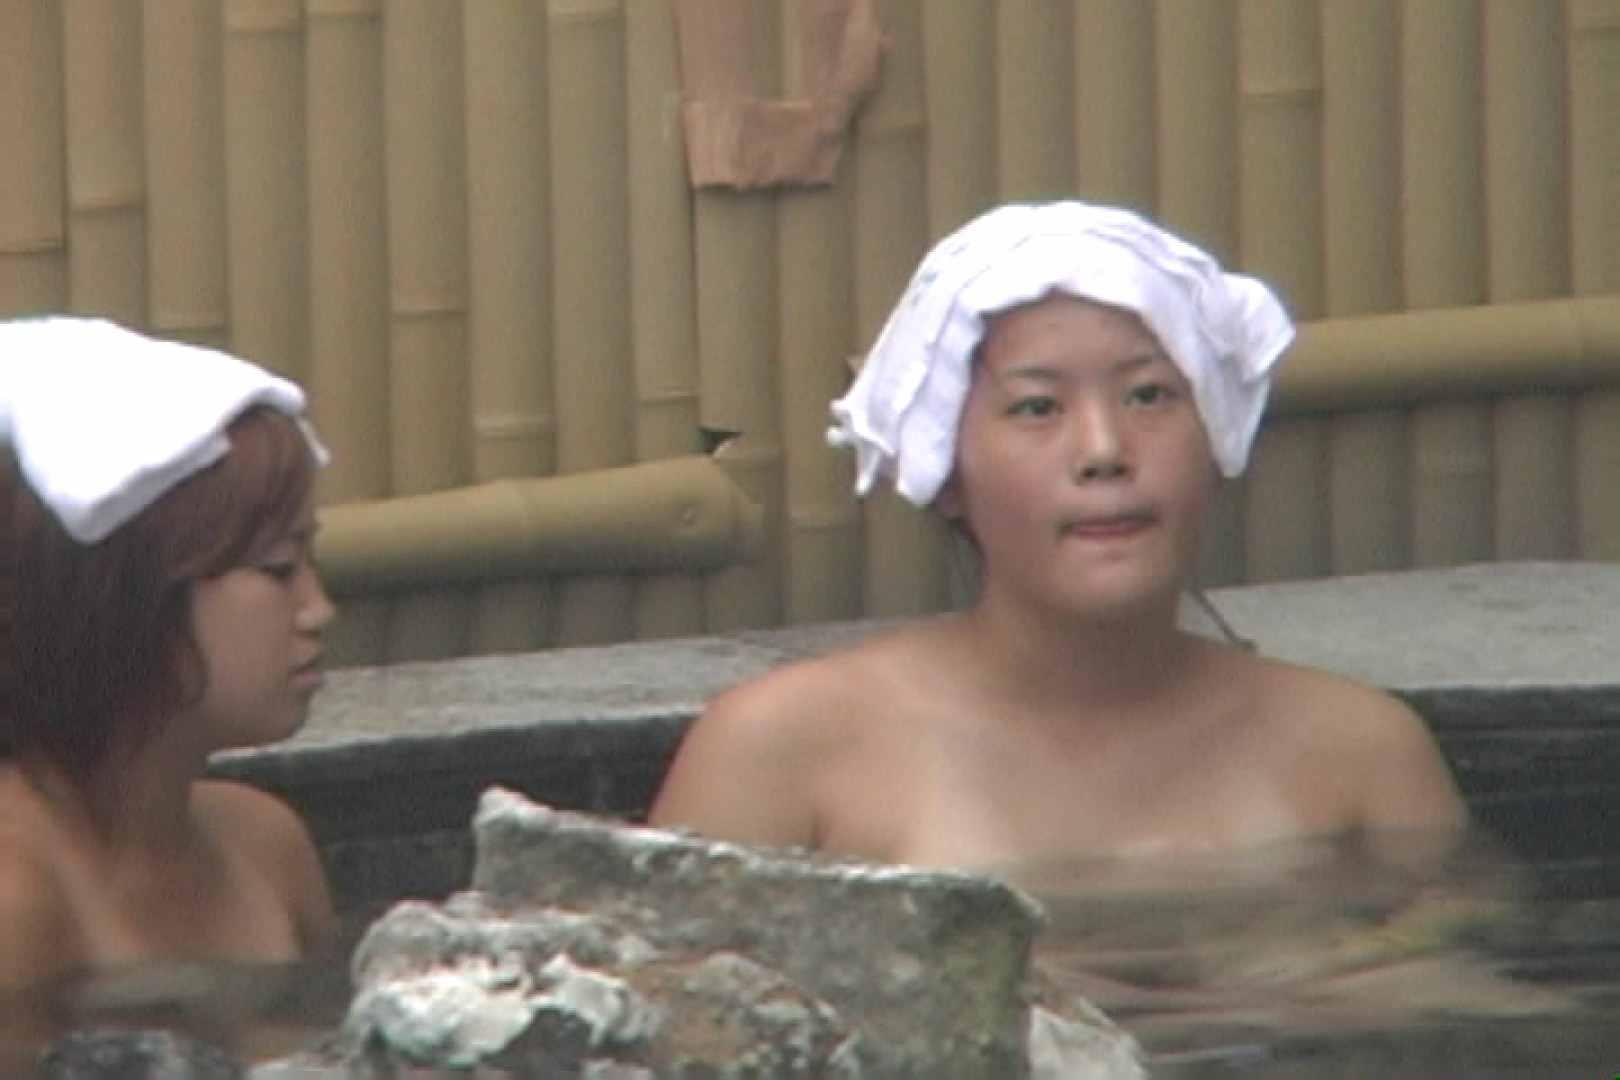 Aquaな露天風呂Vol.42【VIP限定】 いやらしいOL オマンコ動画キャプチャ 68連発 34